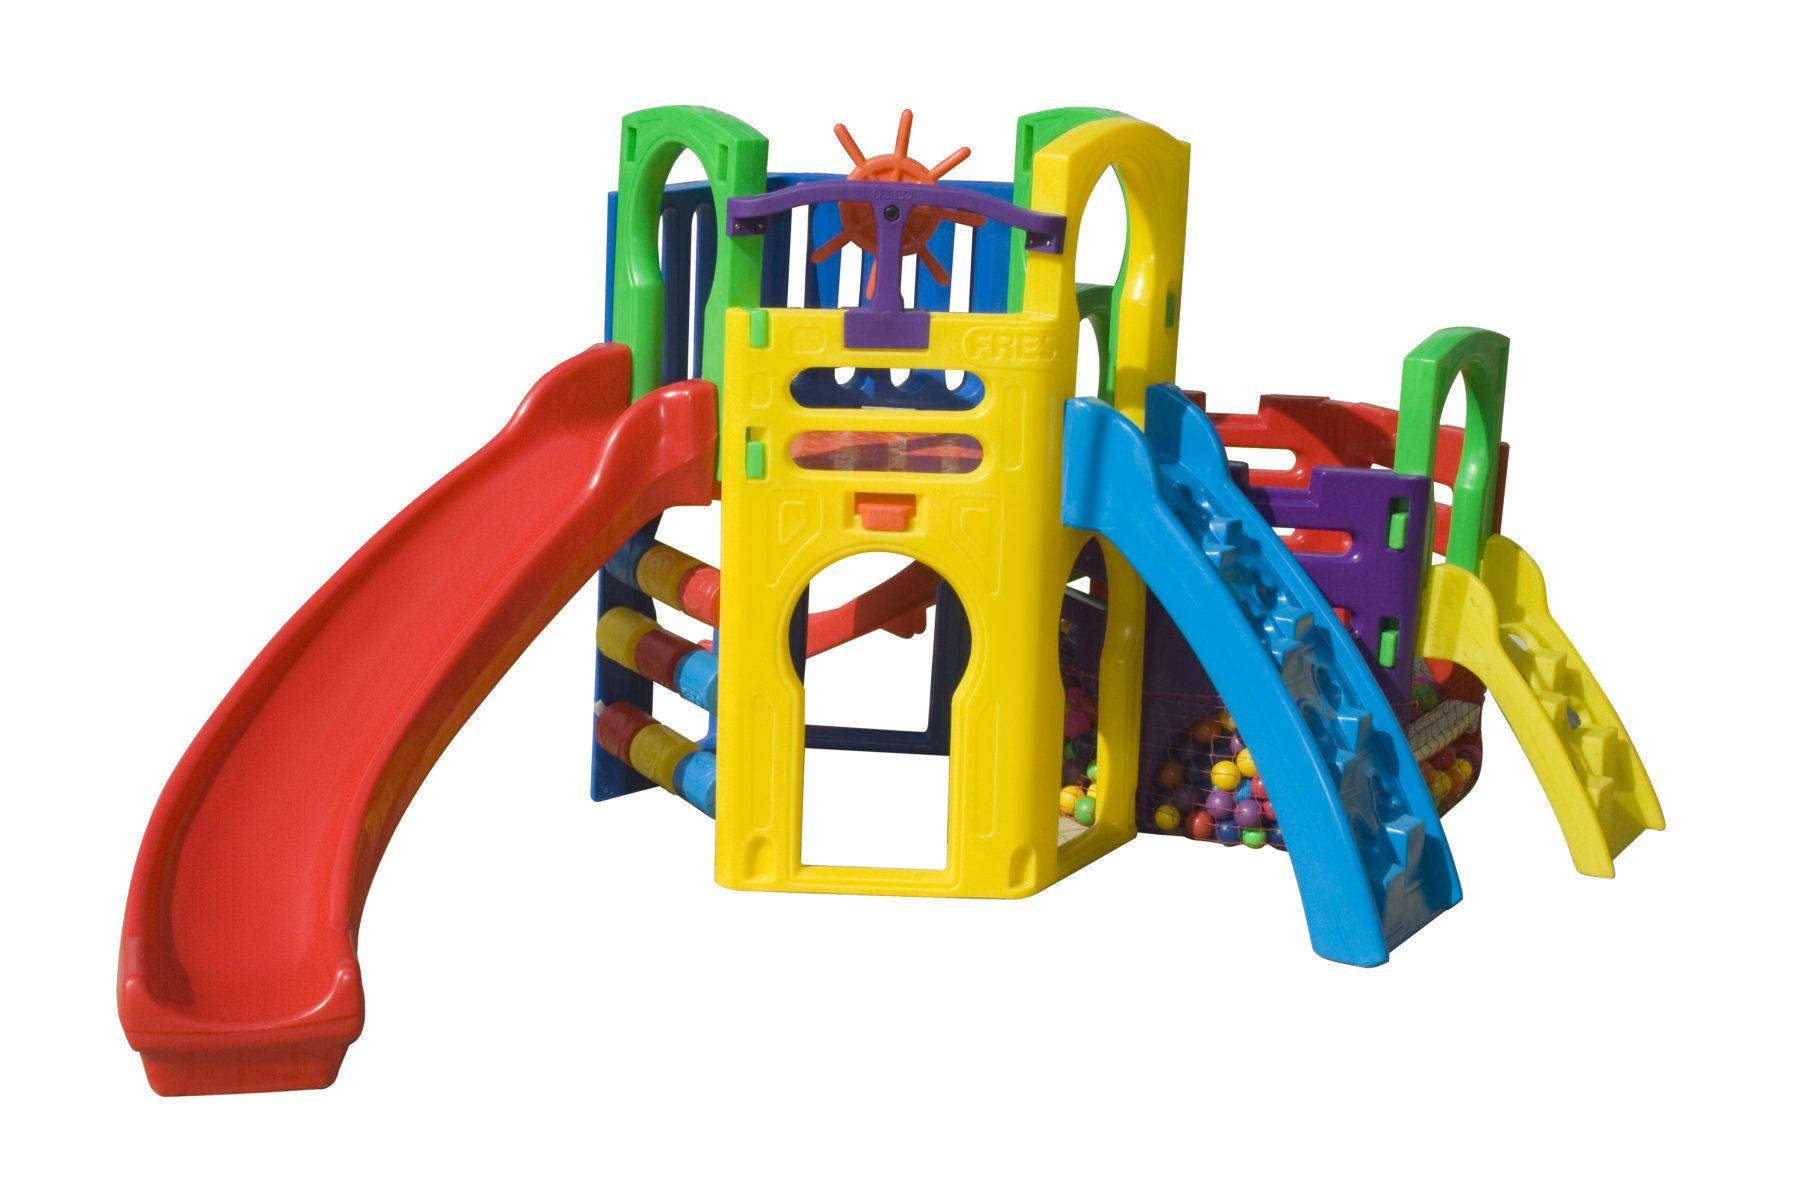 Playground Multiplay Festa | 4m50 x 2m50 x 1m85 | 1 a 12 anos